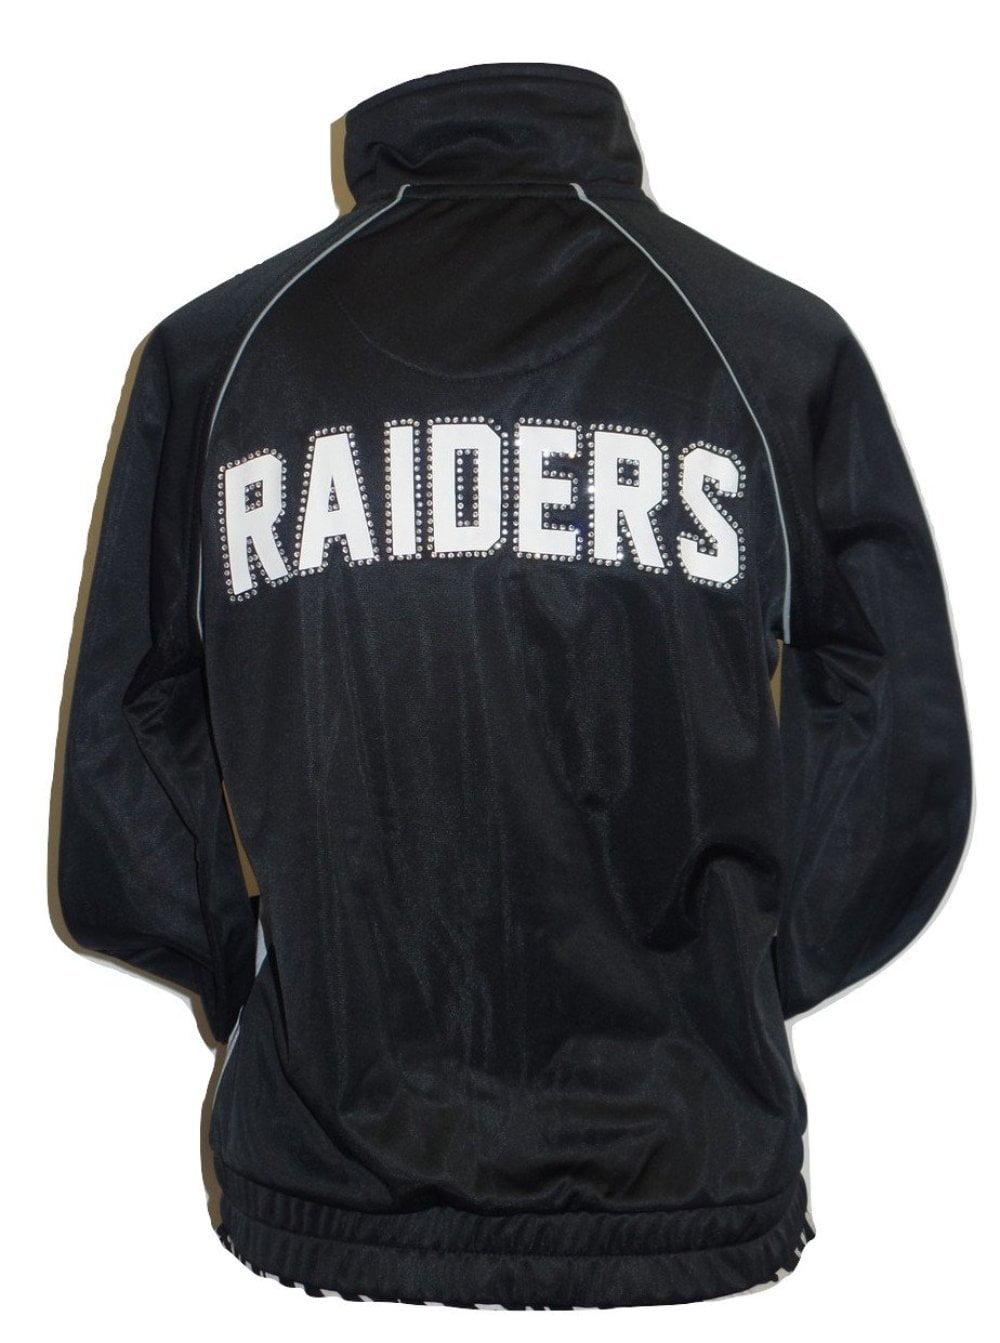 e51b8257 Oakland Football Raiders Women's Track Jacket with Rhinestone Accents